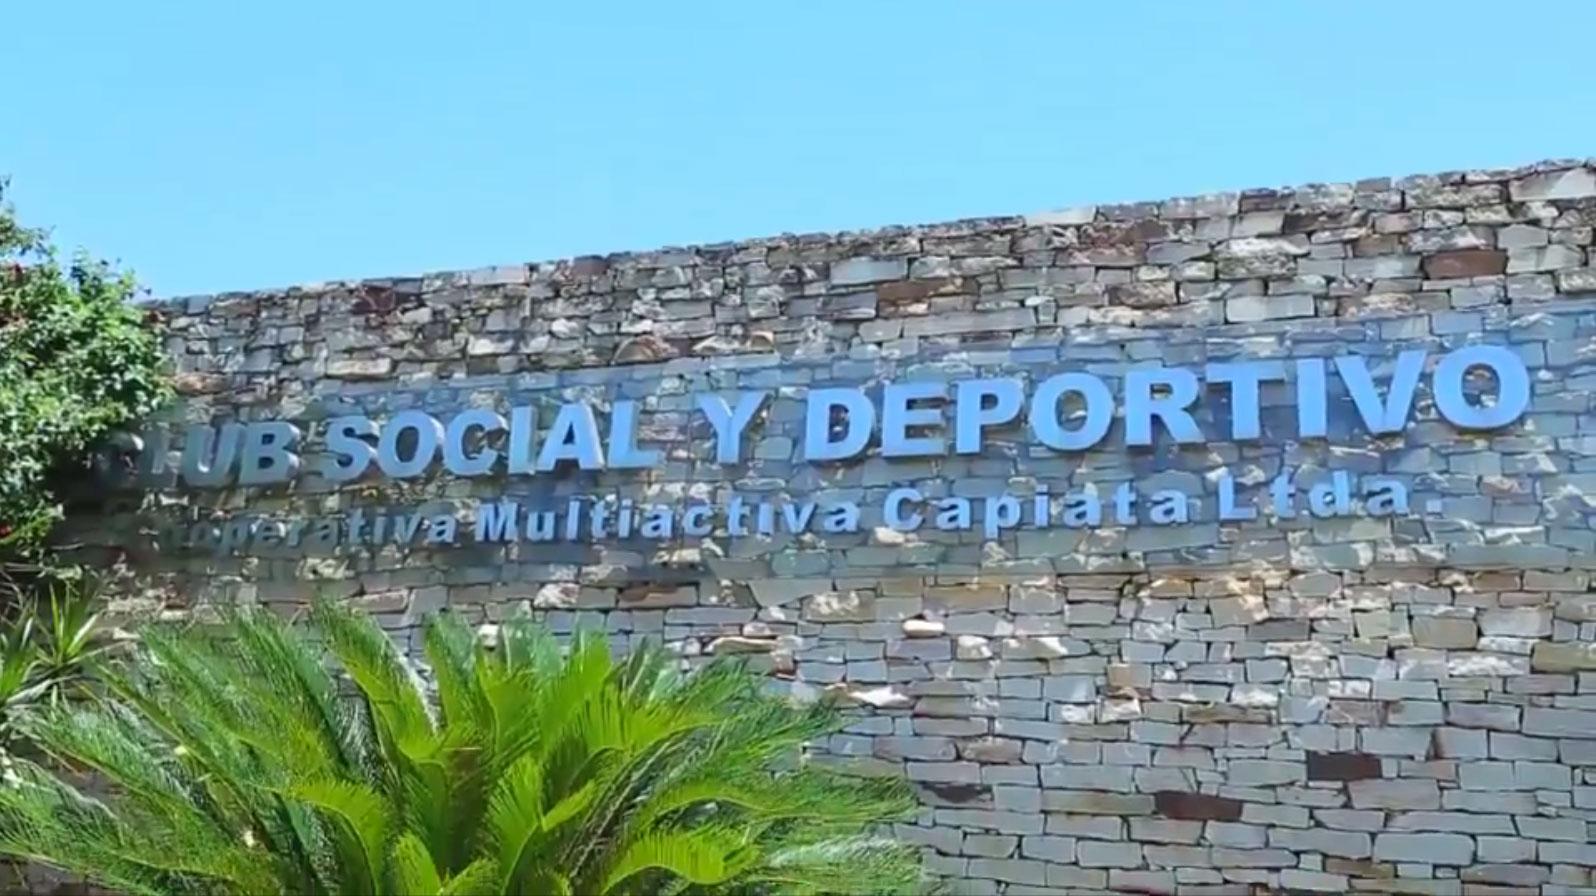 Club Social Y Deportivo Cooperativa Capiata Ltda